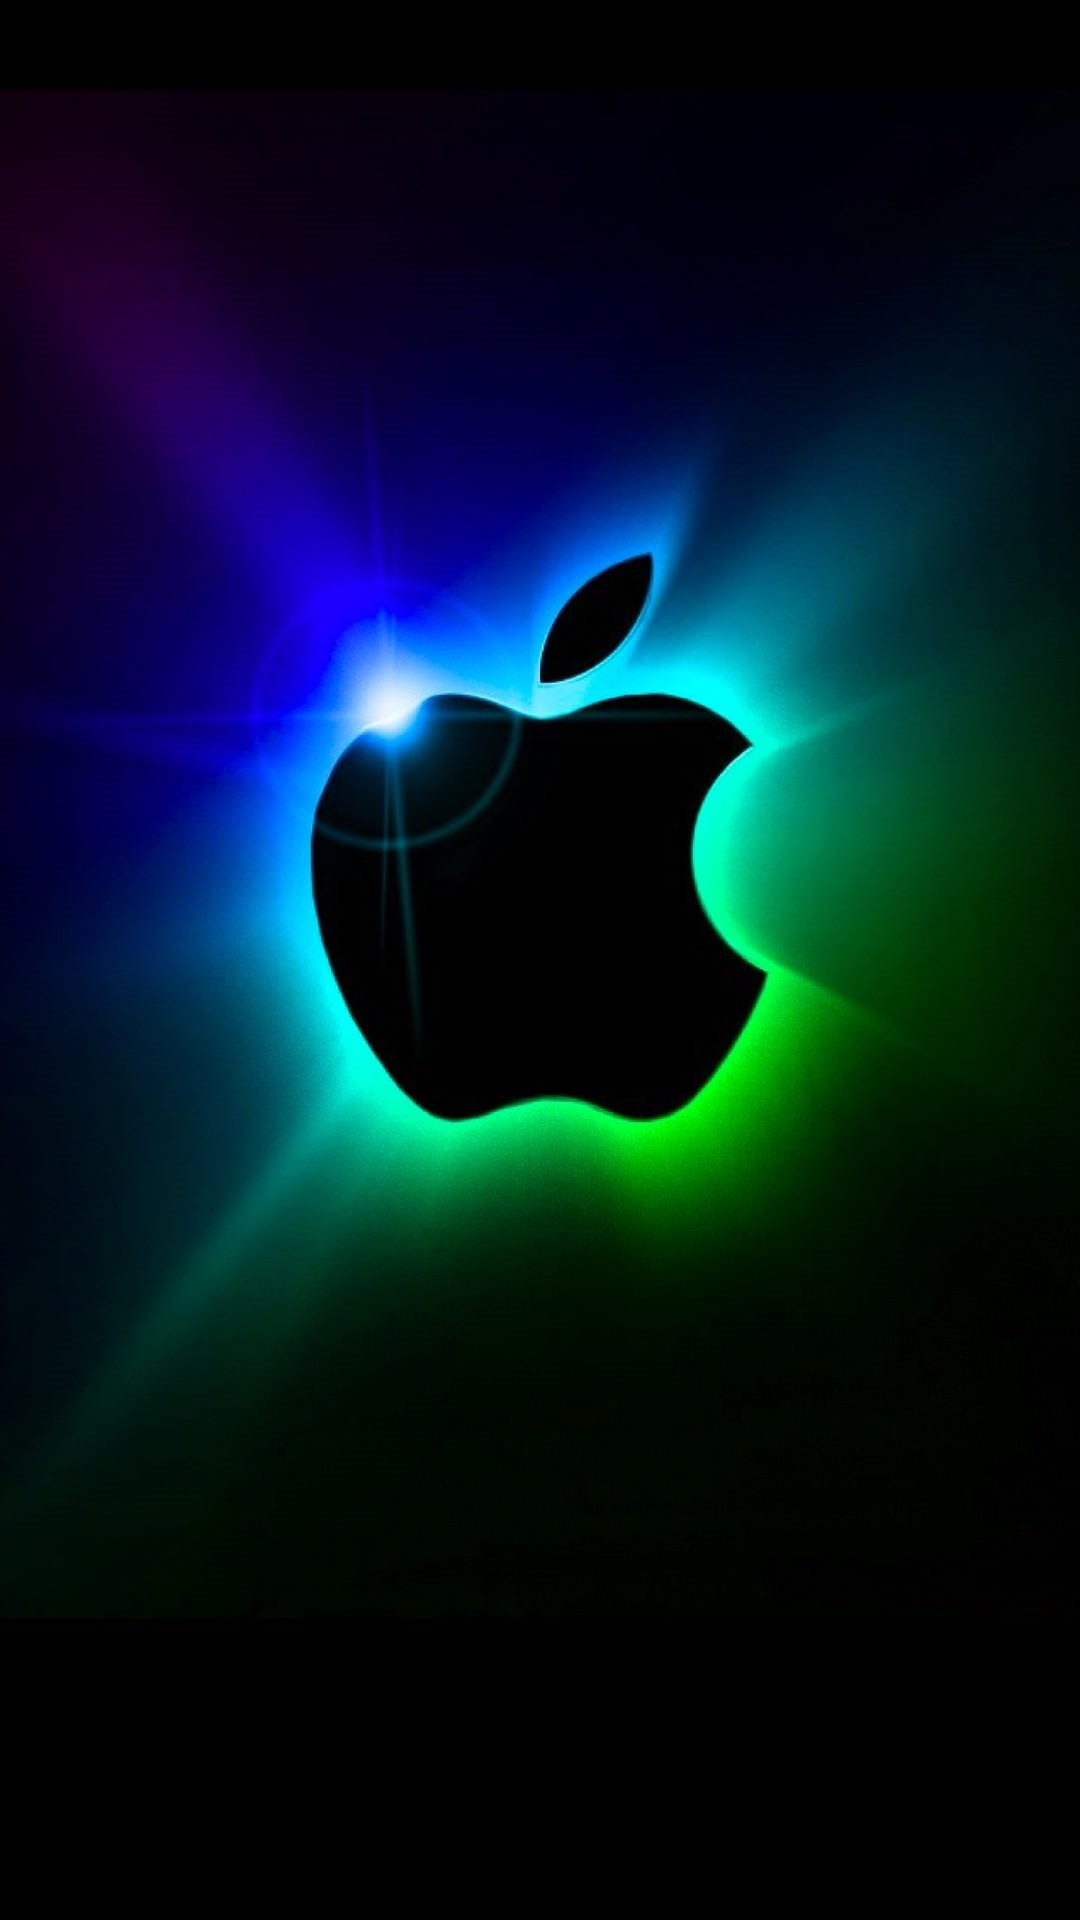 Logo iPhone 7 wallpaper